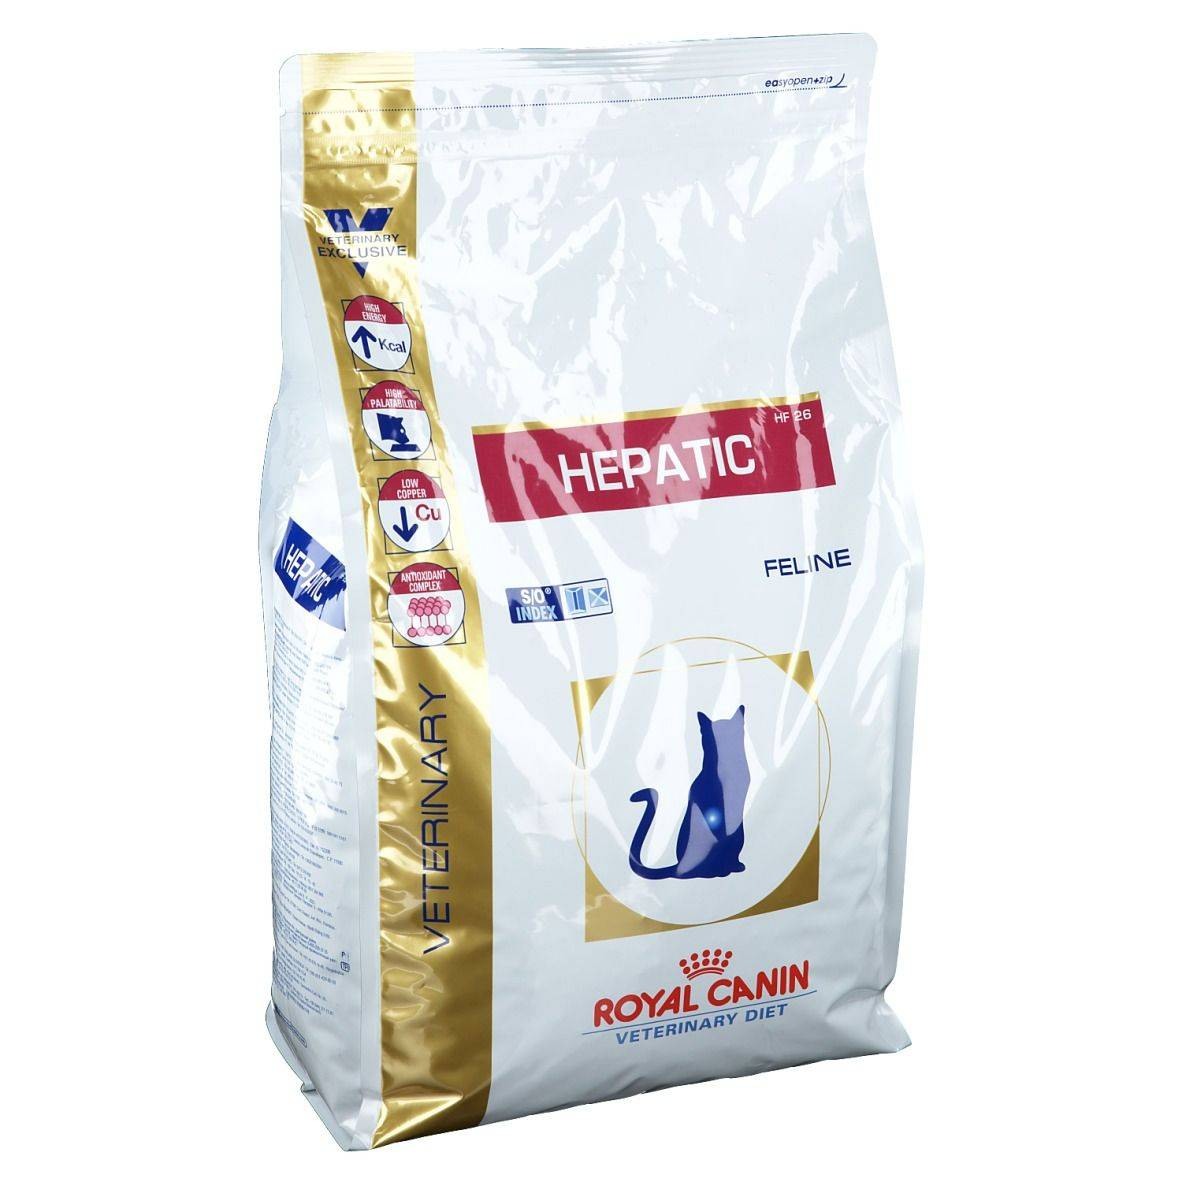 Royal Canin Hepatic Aliment pour chat kg alimentation pour animal